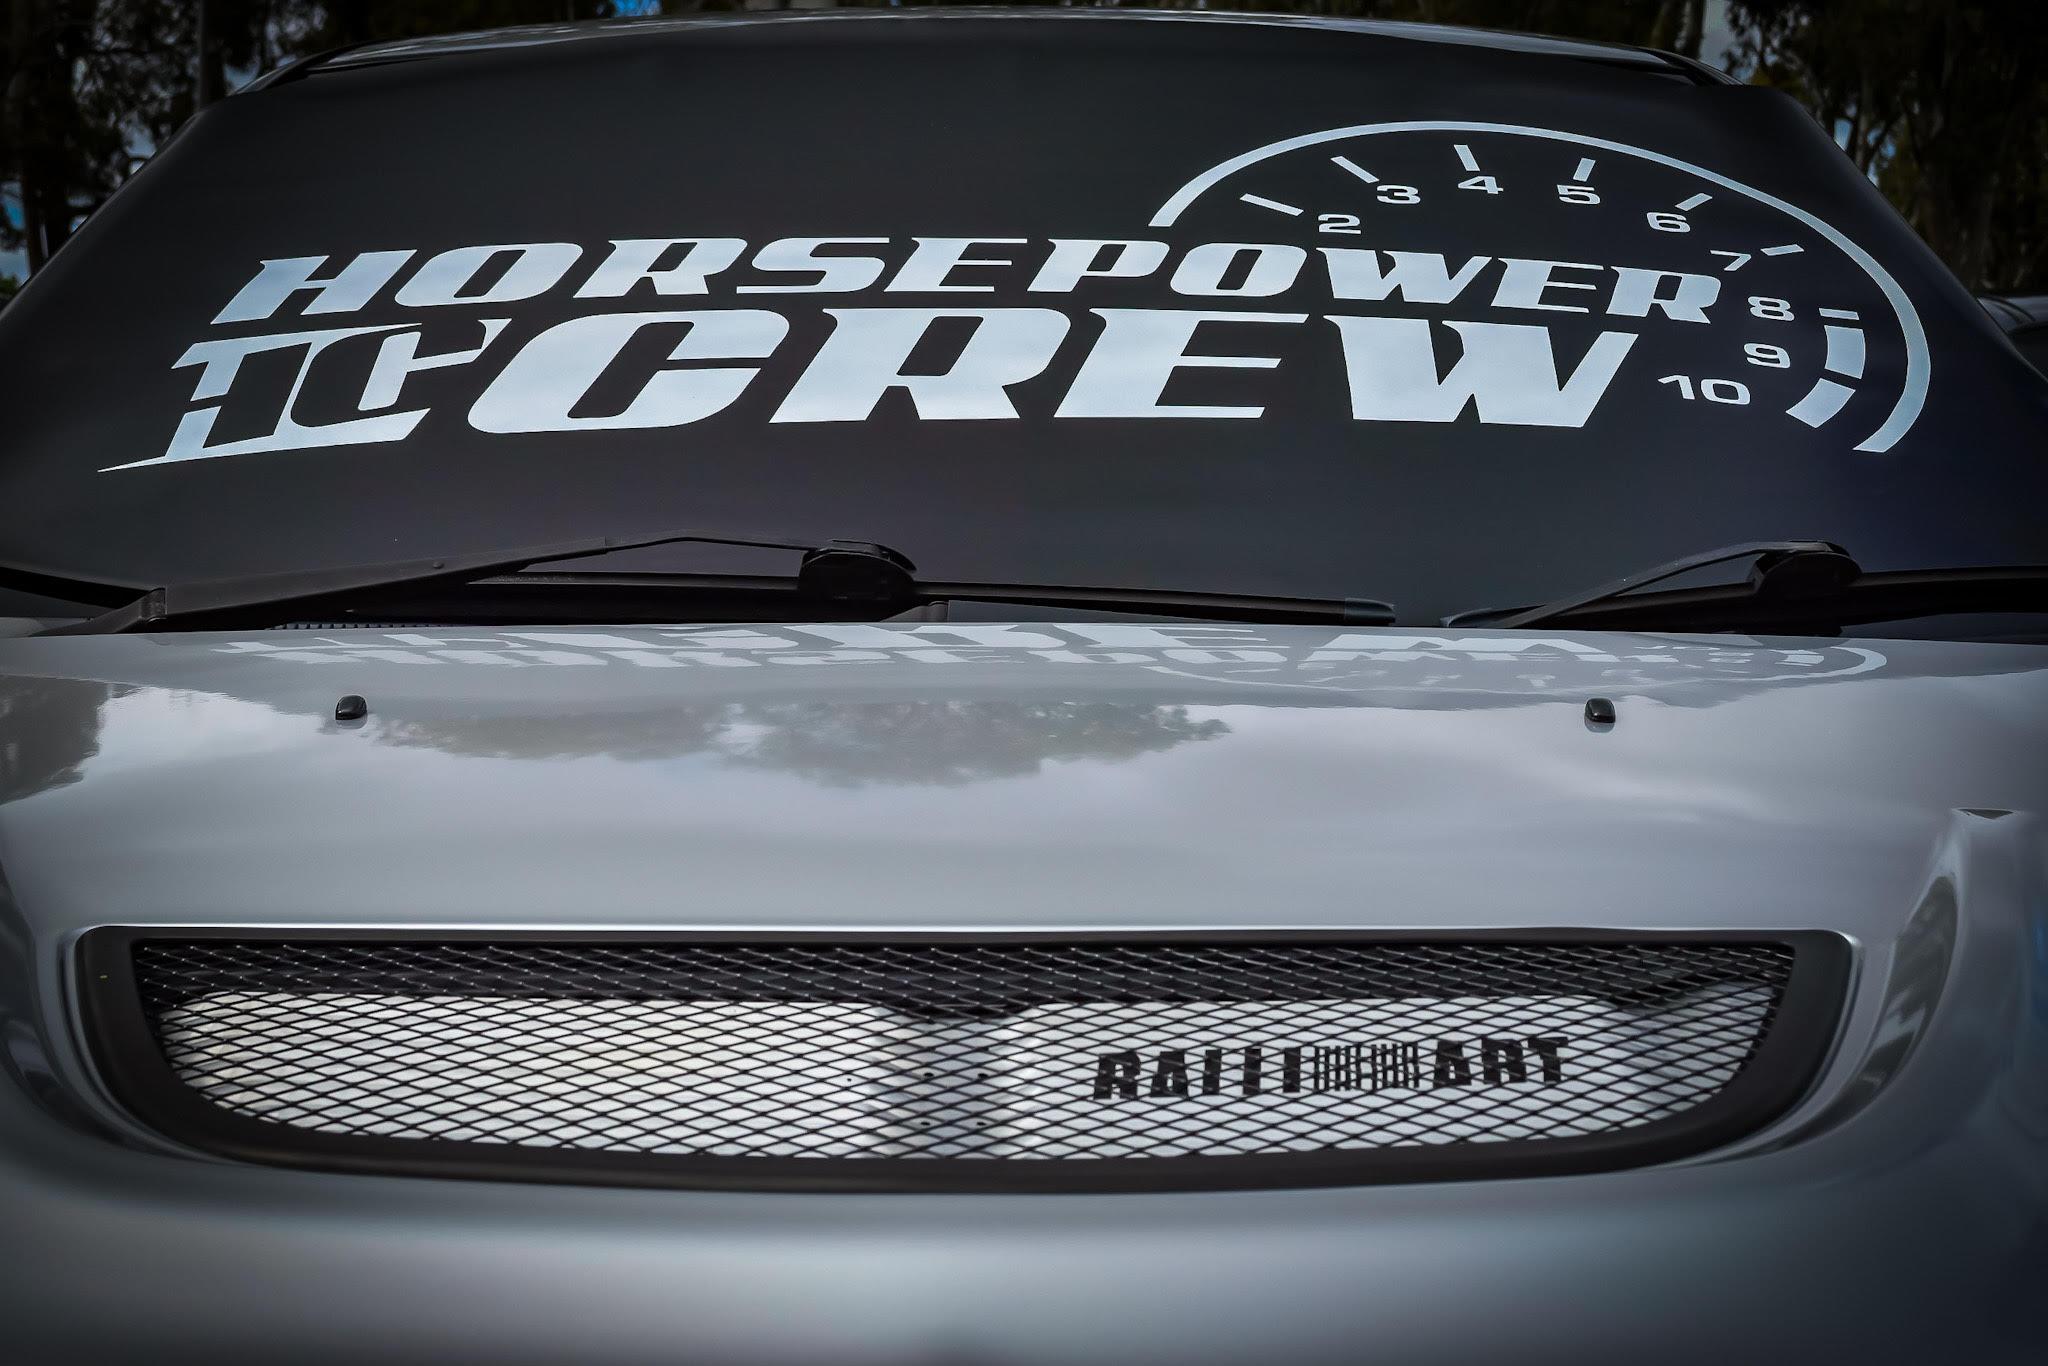 windscreen-cover-rev-gauge-modern-size-black-and-white-Sams-lancer-Copy